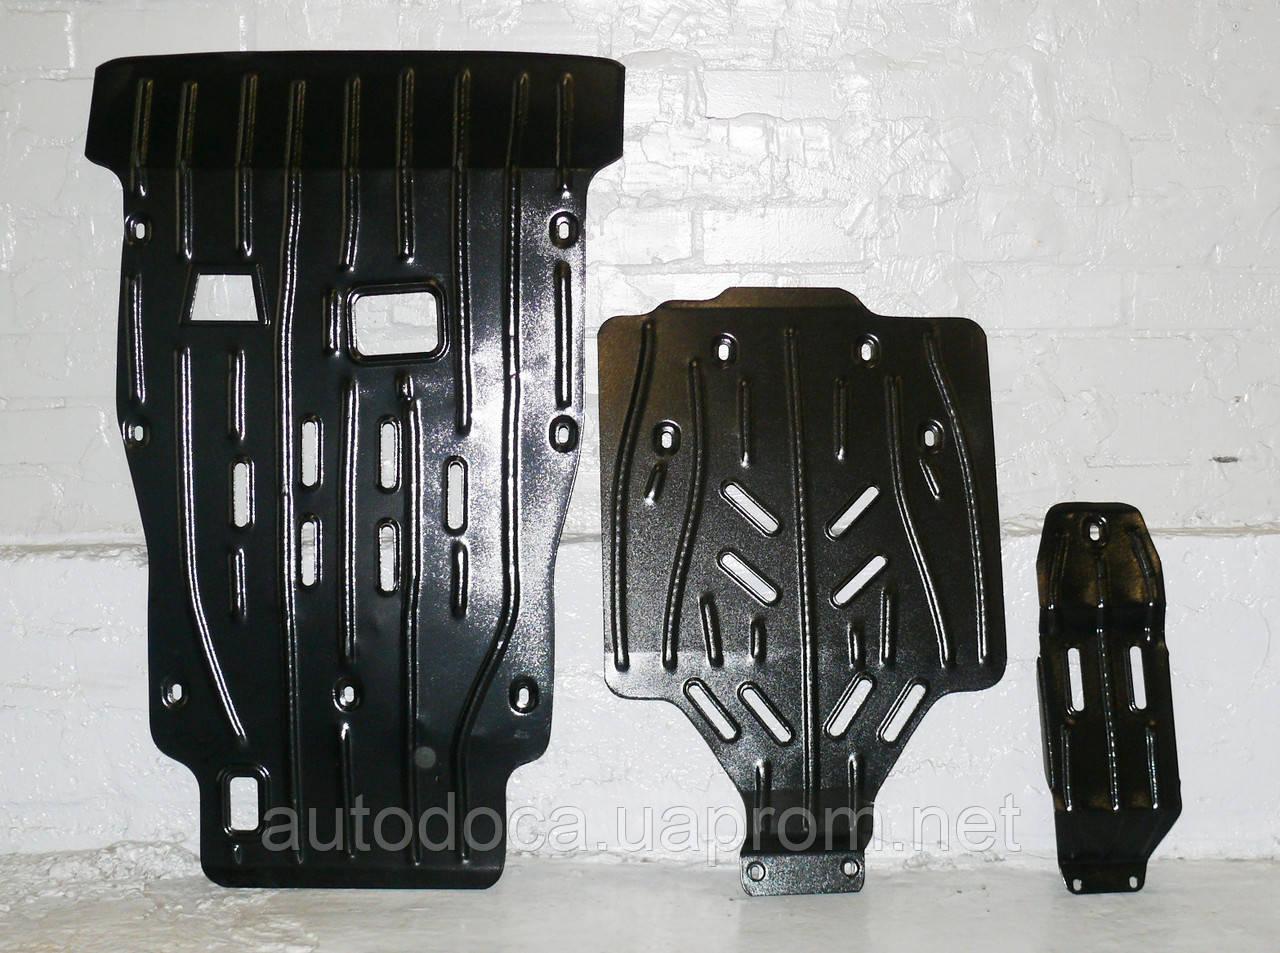 Защита картера двигателя и акпп, ркпп, диф-ла Porsche Cayenne 2003-